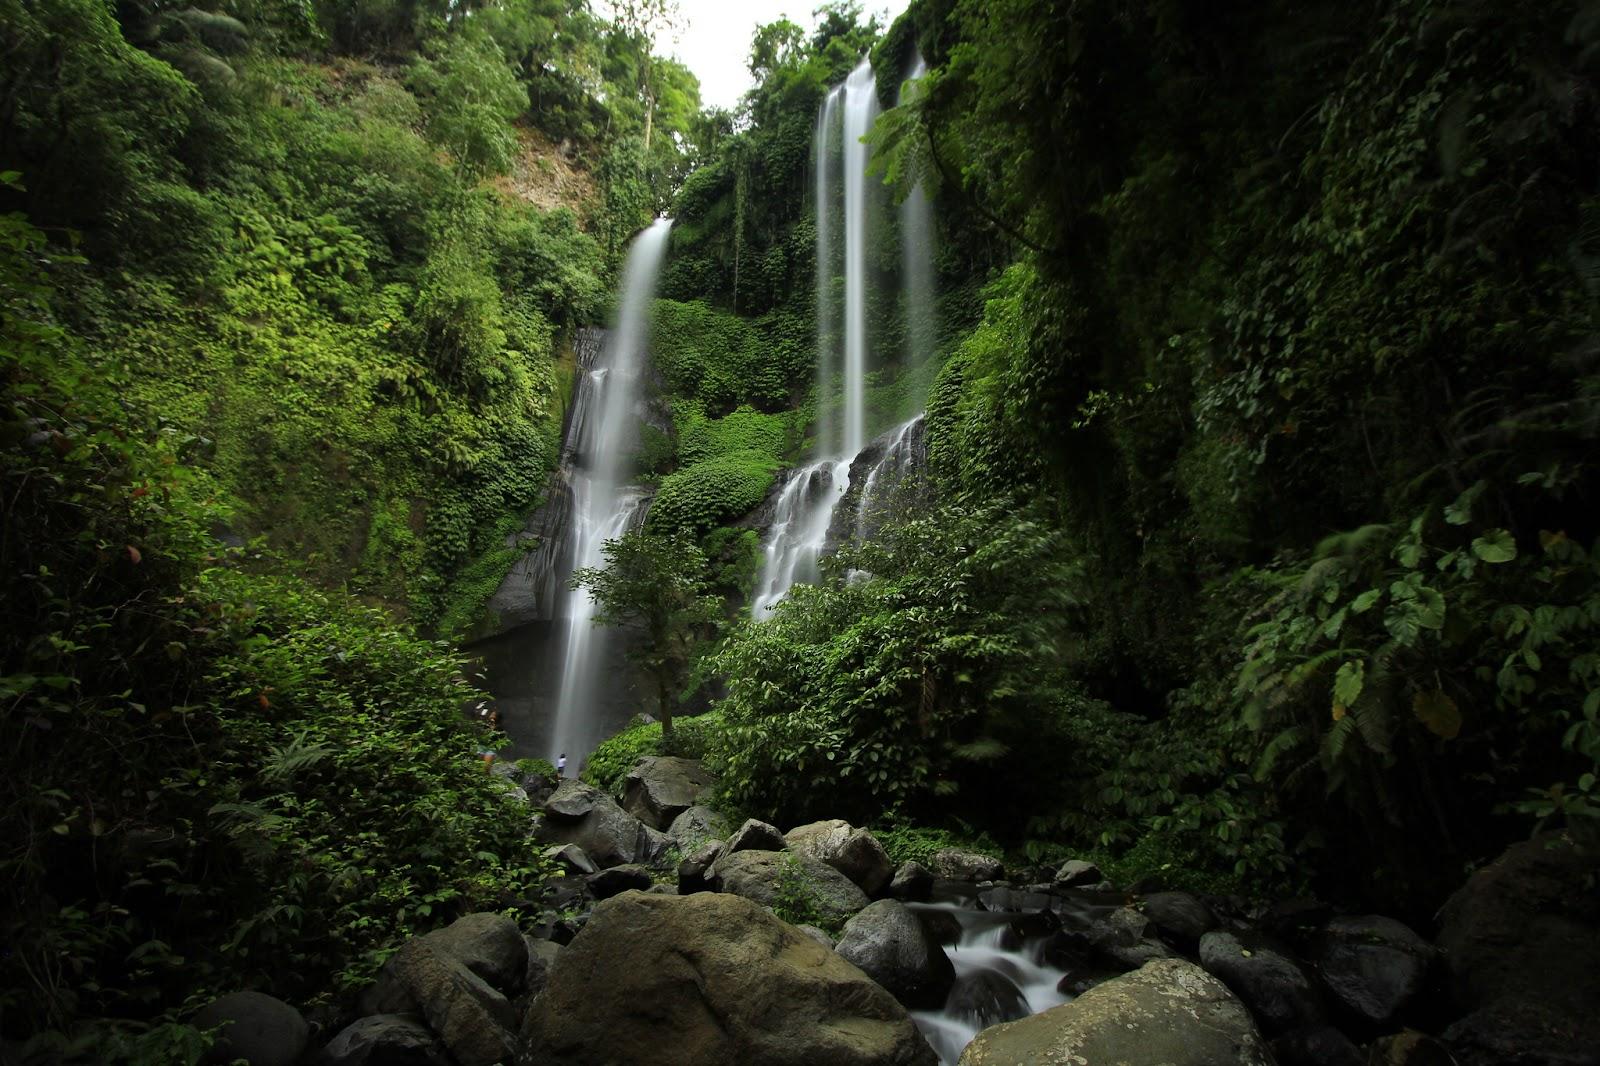 Sekumpul Waterfall is one of the most beautiful waterfalls in Bali